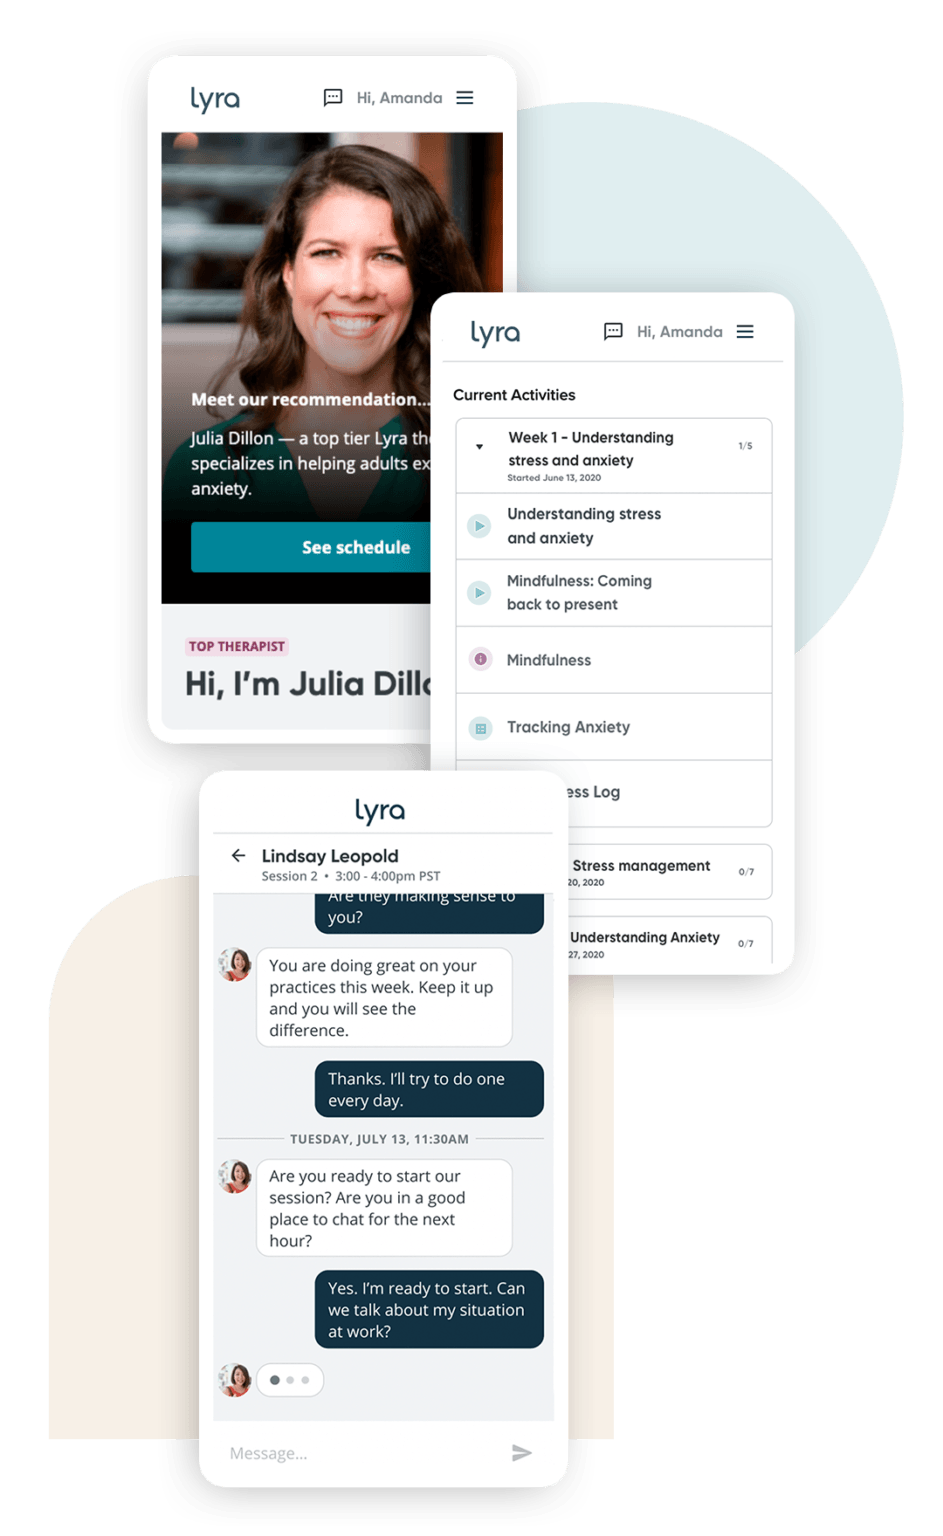 Lyra Raises Massive $187M at $2.3B Valuation for Digital Mental Health Platform